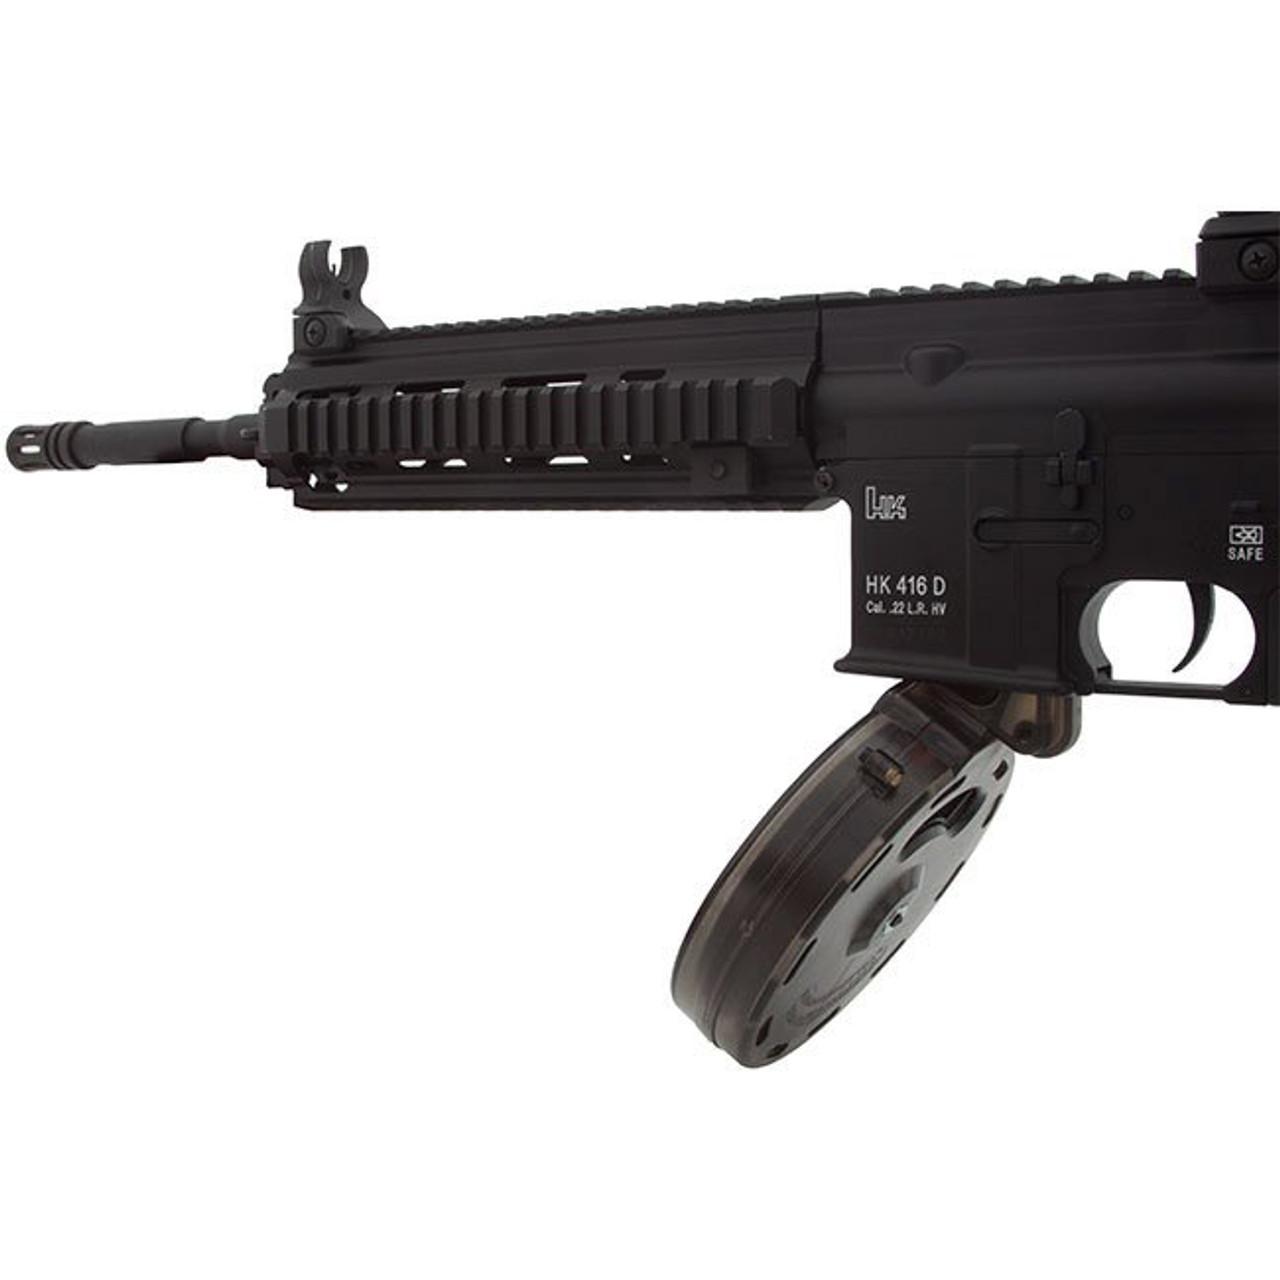 Black Dog 50 round  22LR drum magazine for HK416 G36 M4 M16 ARX160